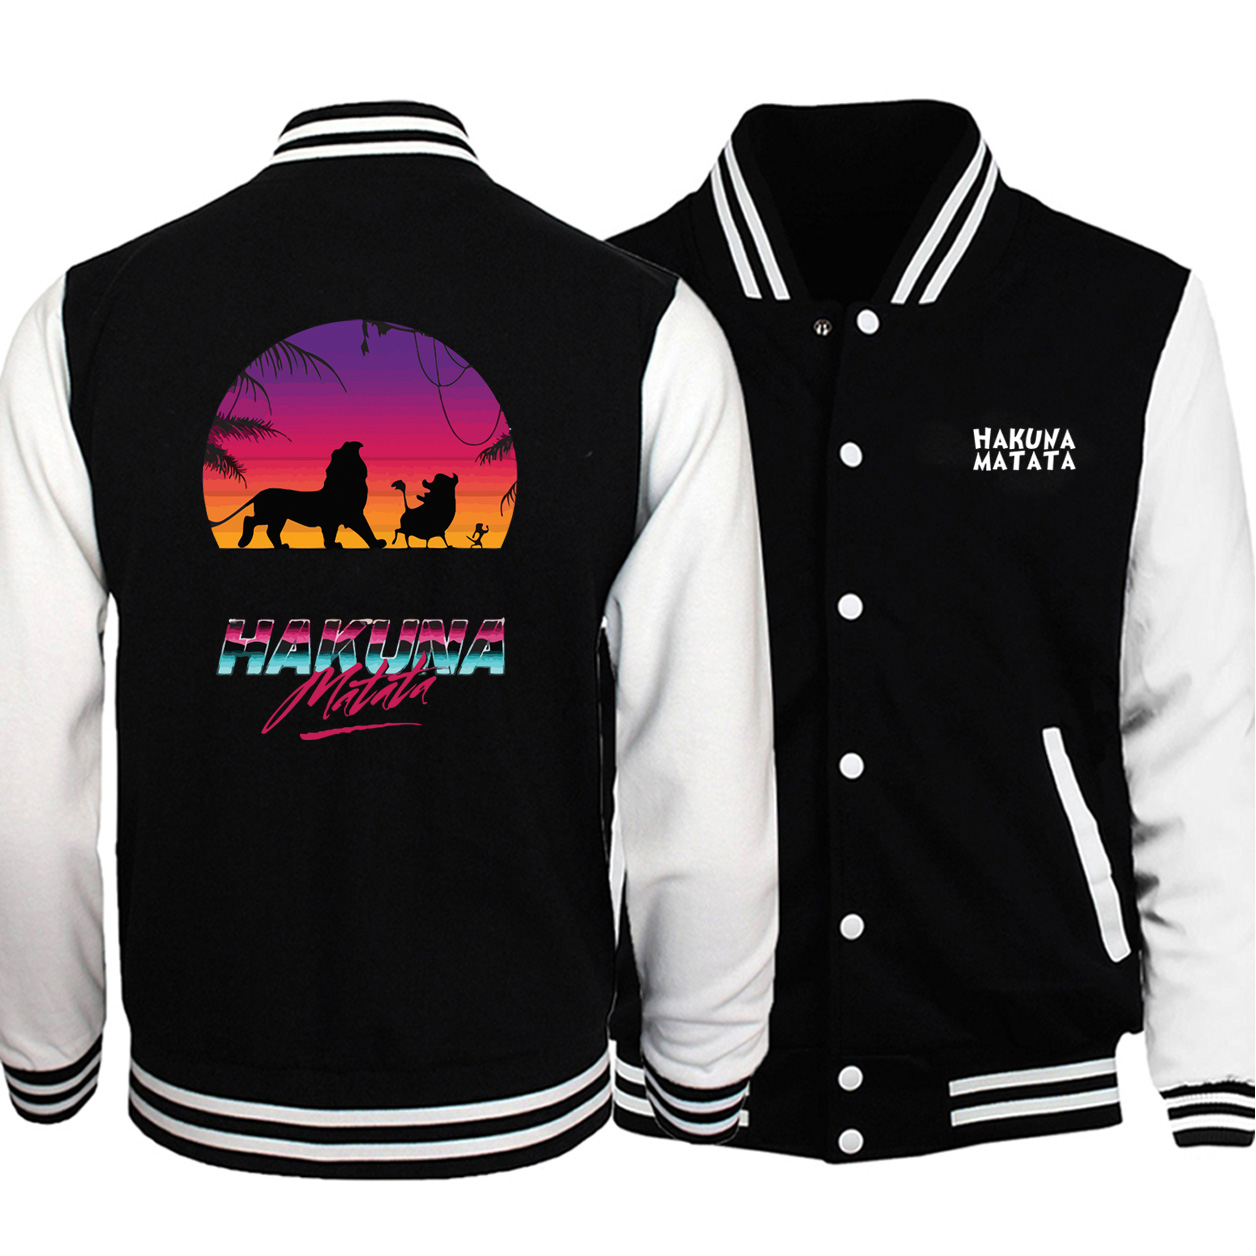 Lion King Hakuna Matata Men Baseball Jacket Men Autumn Casual Casual Plus Size Sportswear Hip Hop Streetwear Bomber Jacket